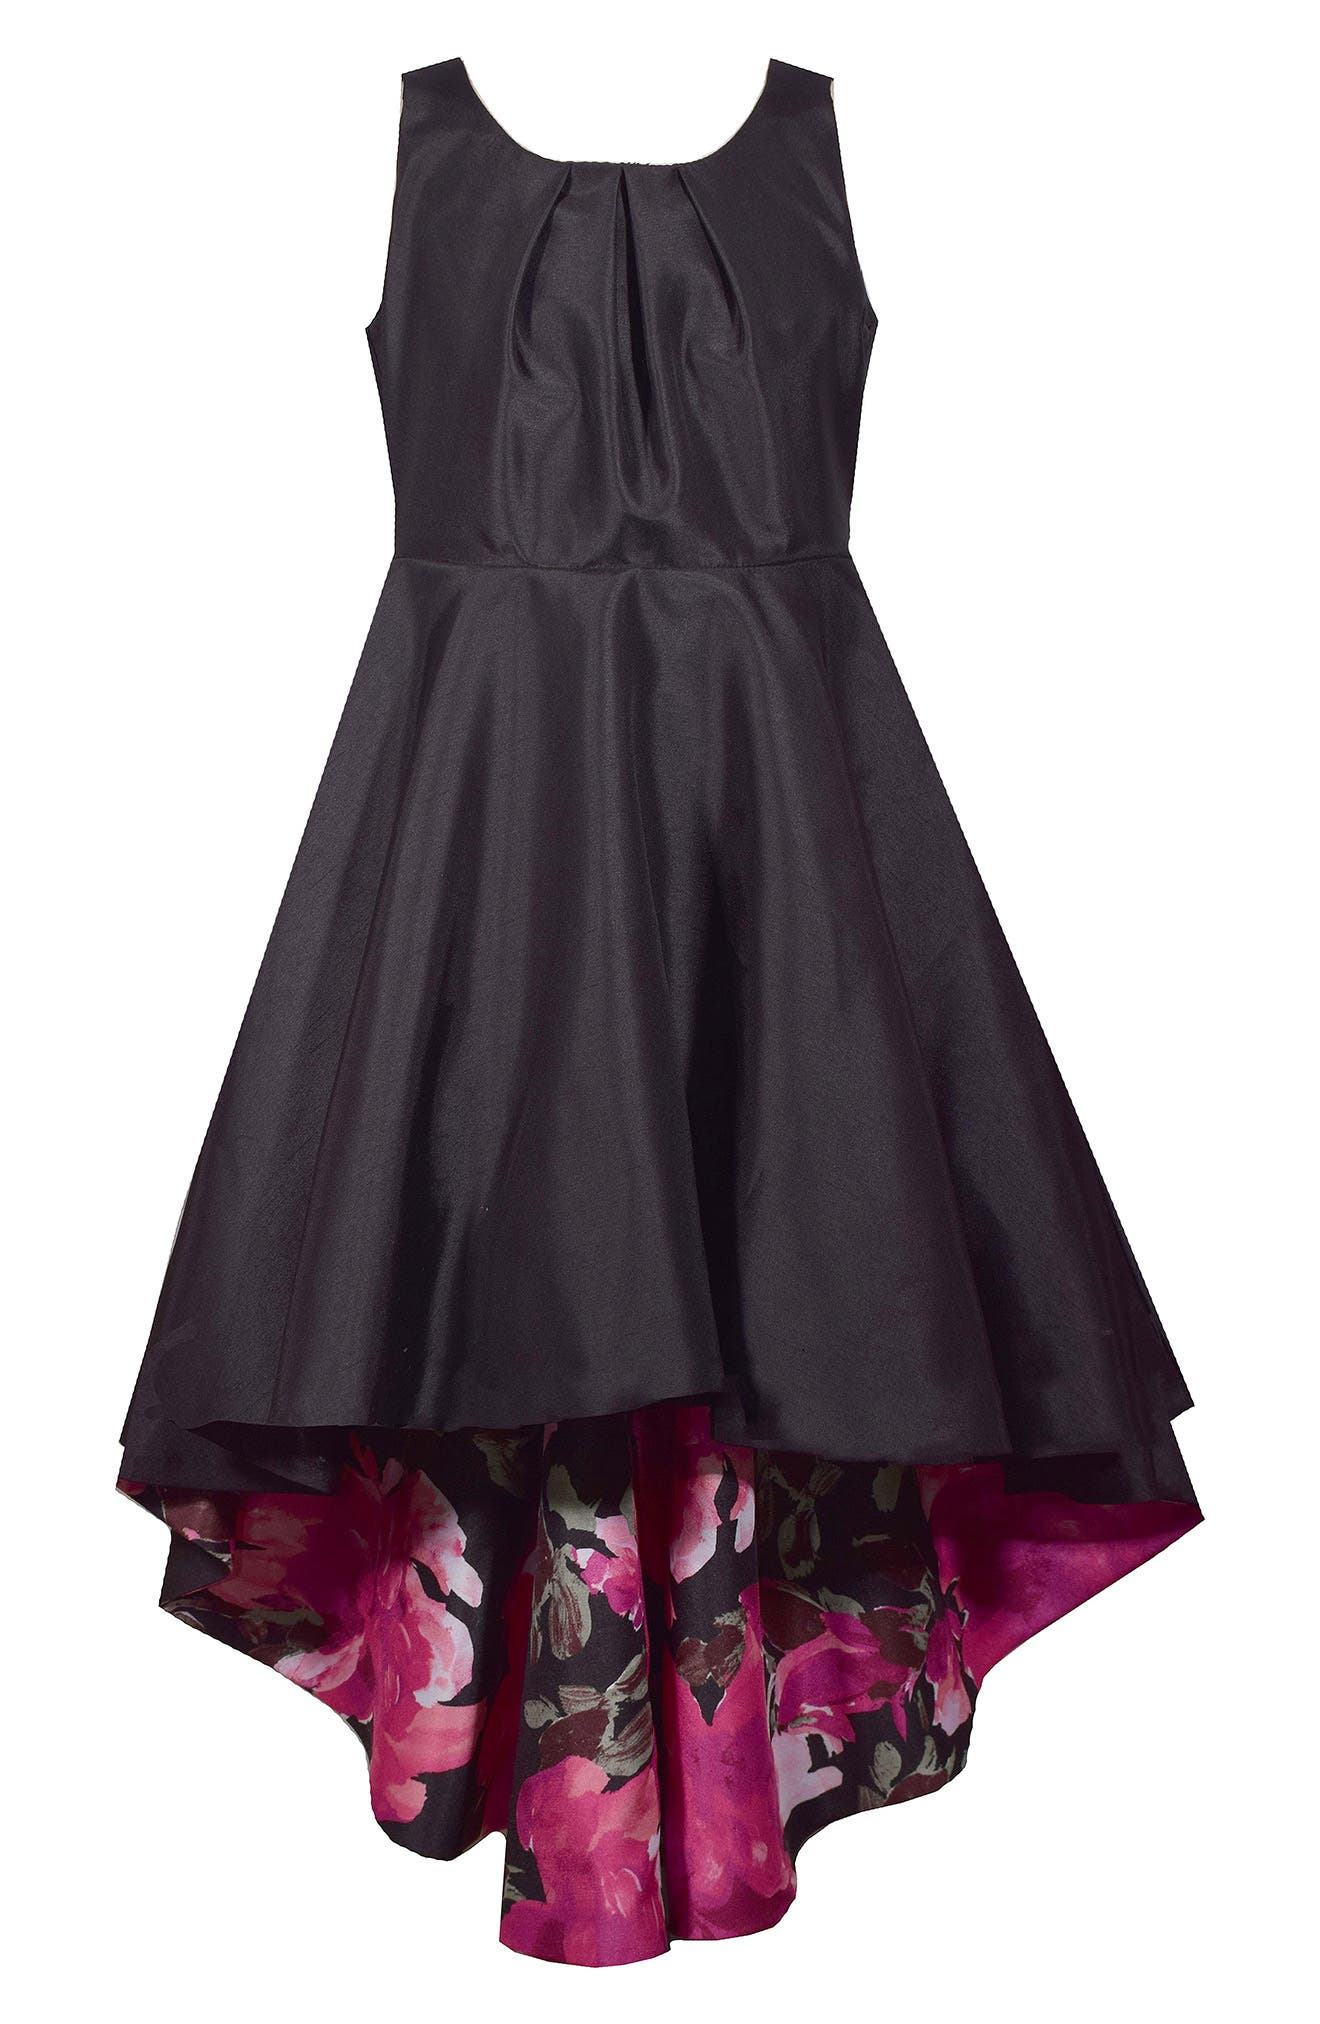 Girls Iris  Ivy Floral Lined Highlow Dress Size 16  Black